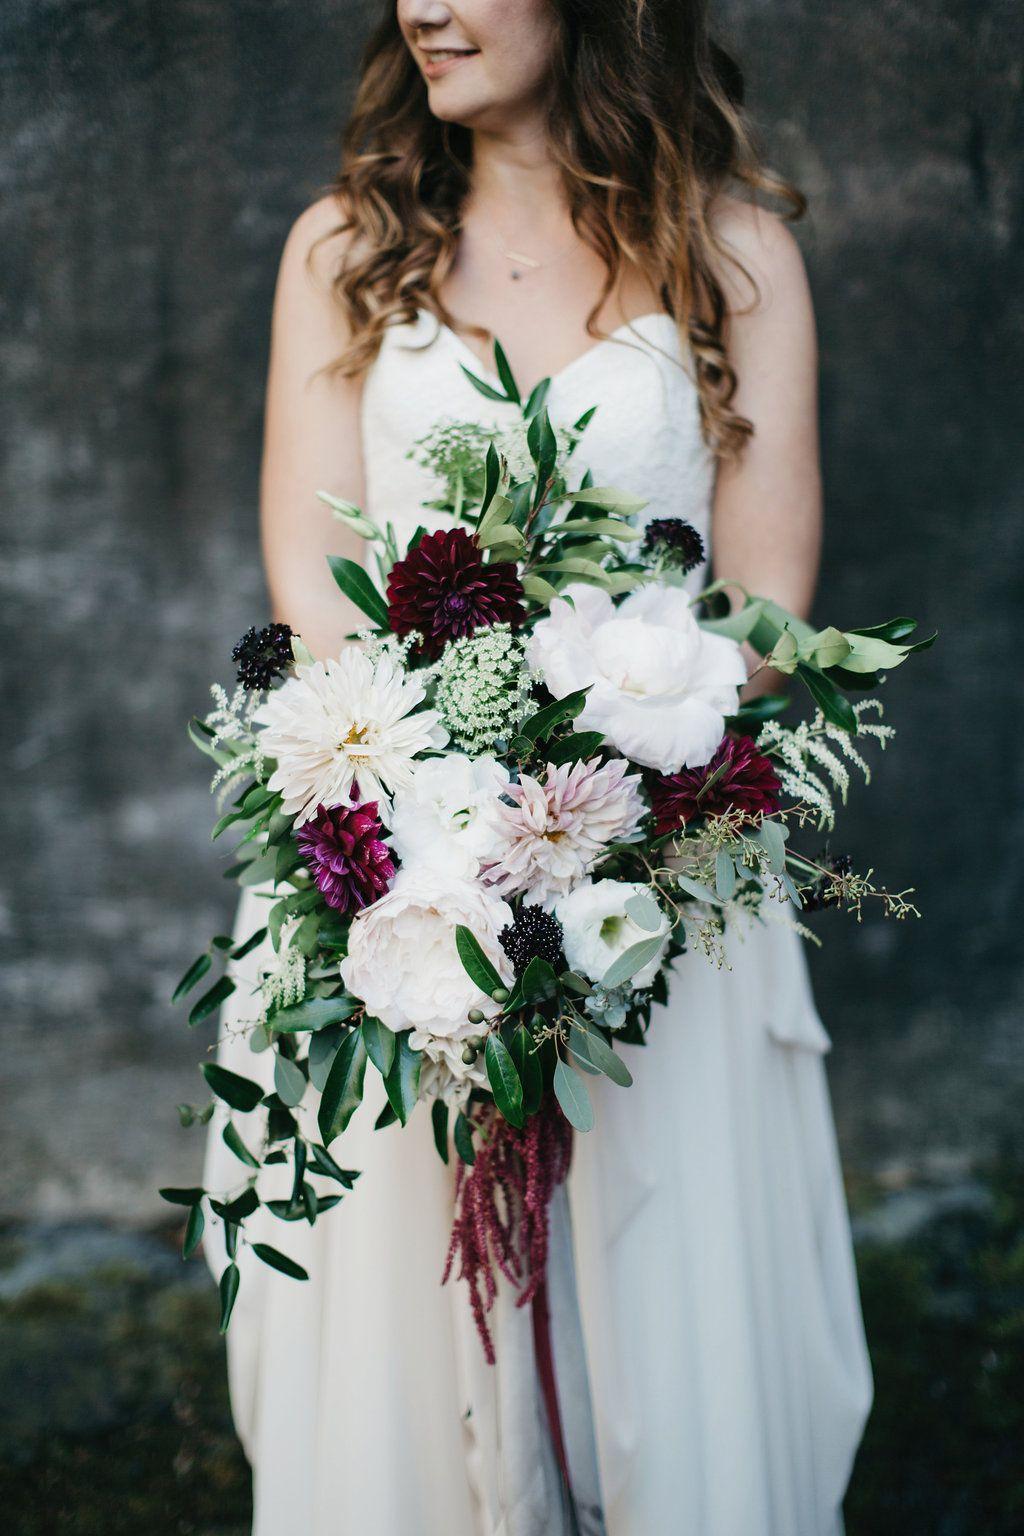 Bridal Bouquet l Maroon Blush Green White Ivory l